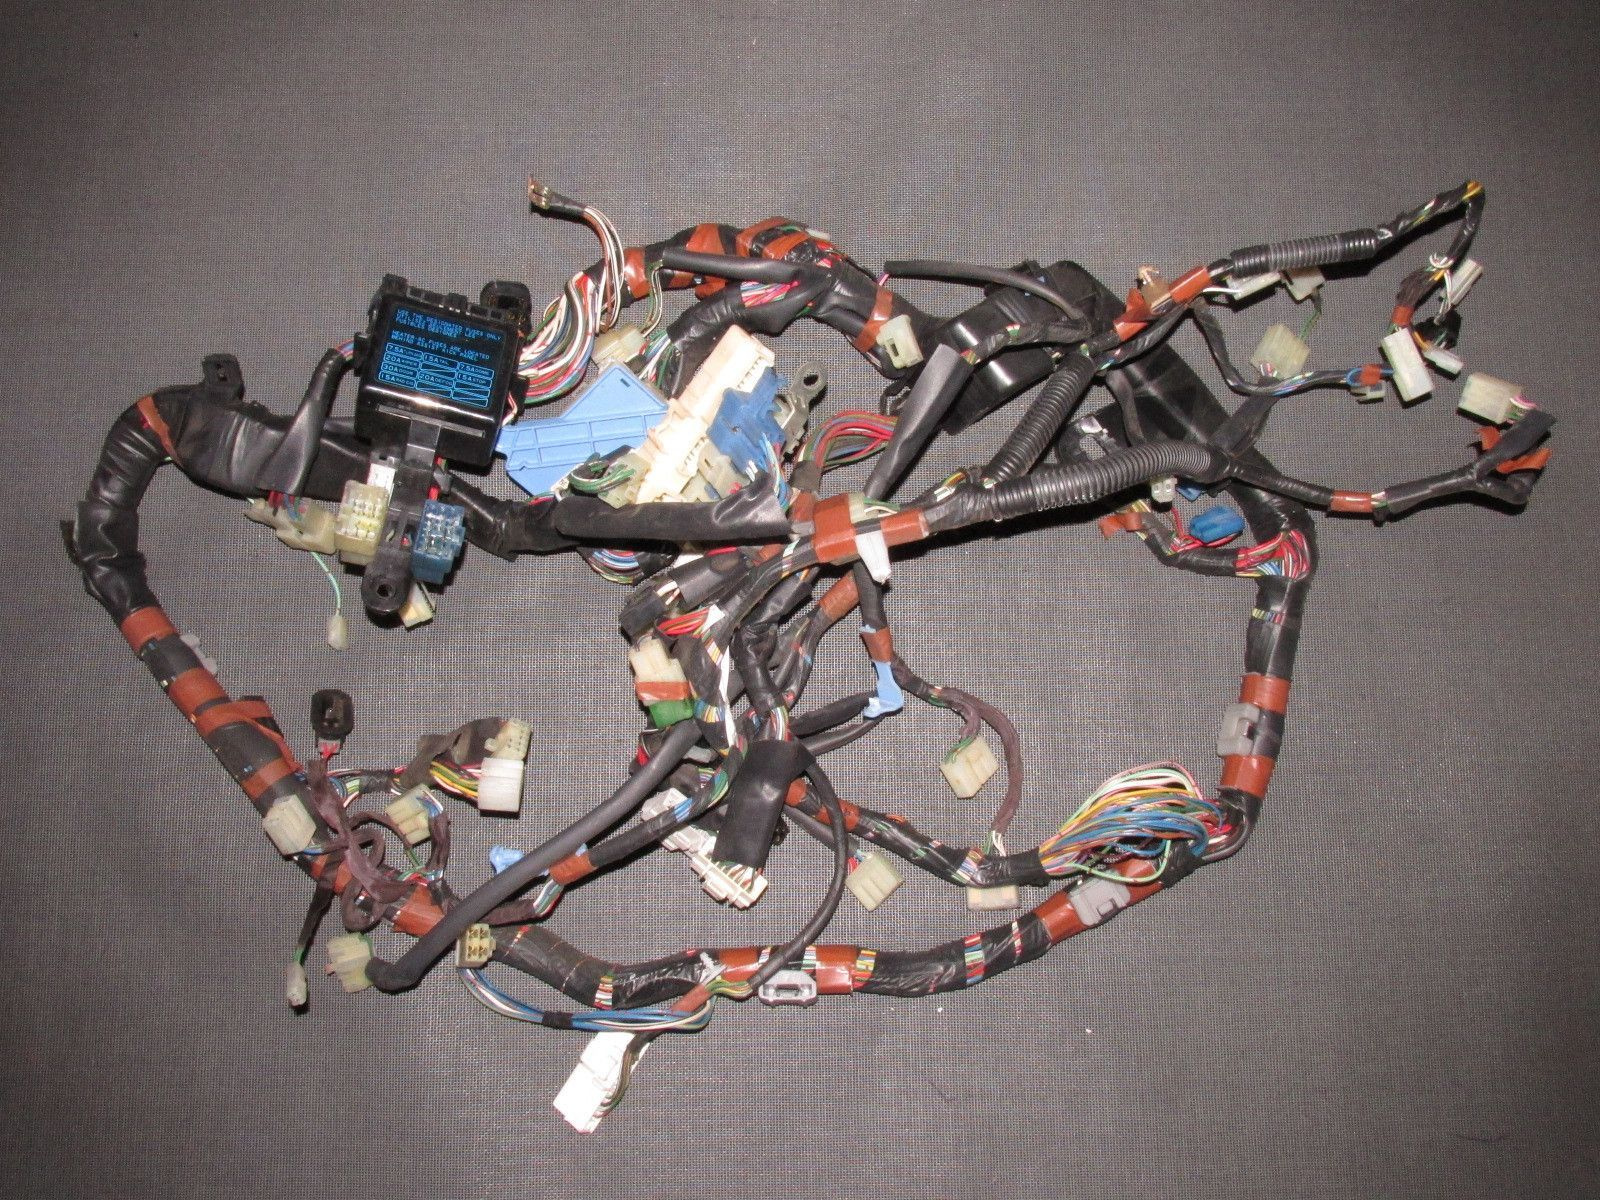 85 86 87 88 89 toyota mr2 oem interior fuse box dash wiring harness [ 1600 x 1200 Pixel ]